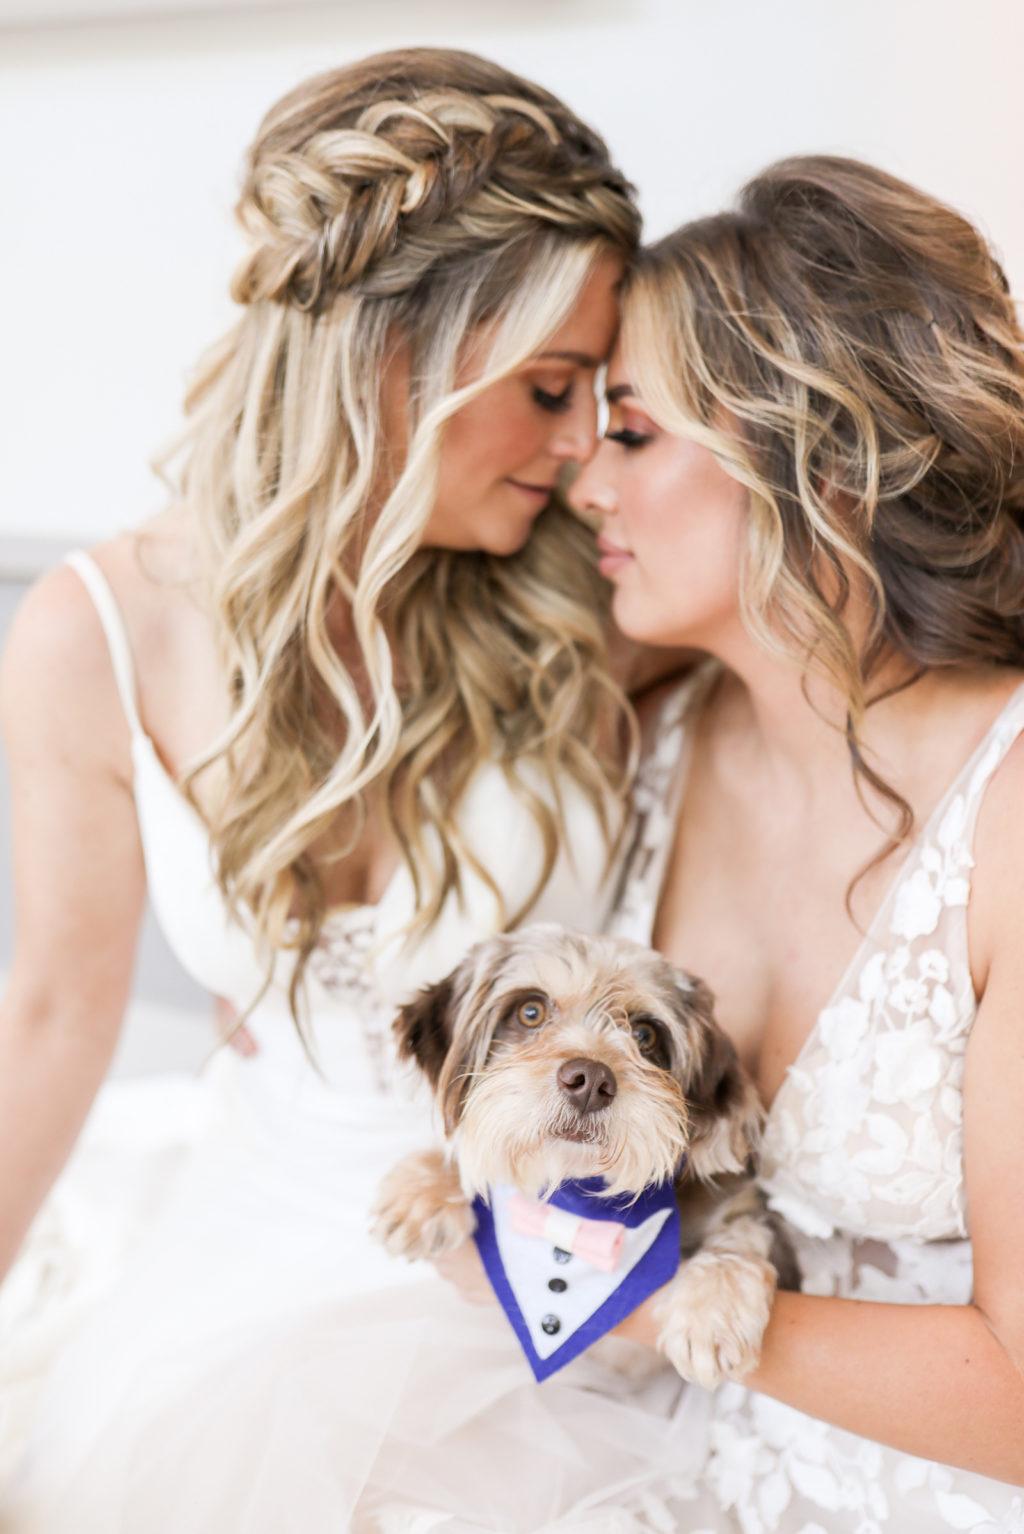 LGBTQ+ Gay Pride Wedding, Lesbian Brides in Boho Braided Hair Holding Dogs with Blue Tuxedos